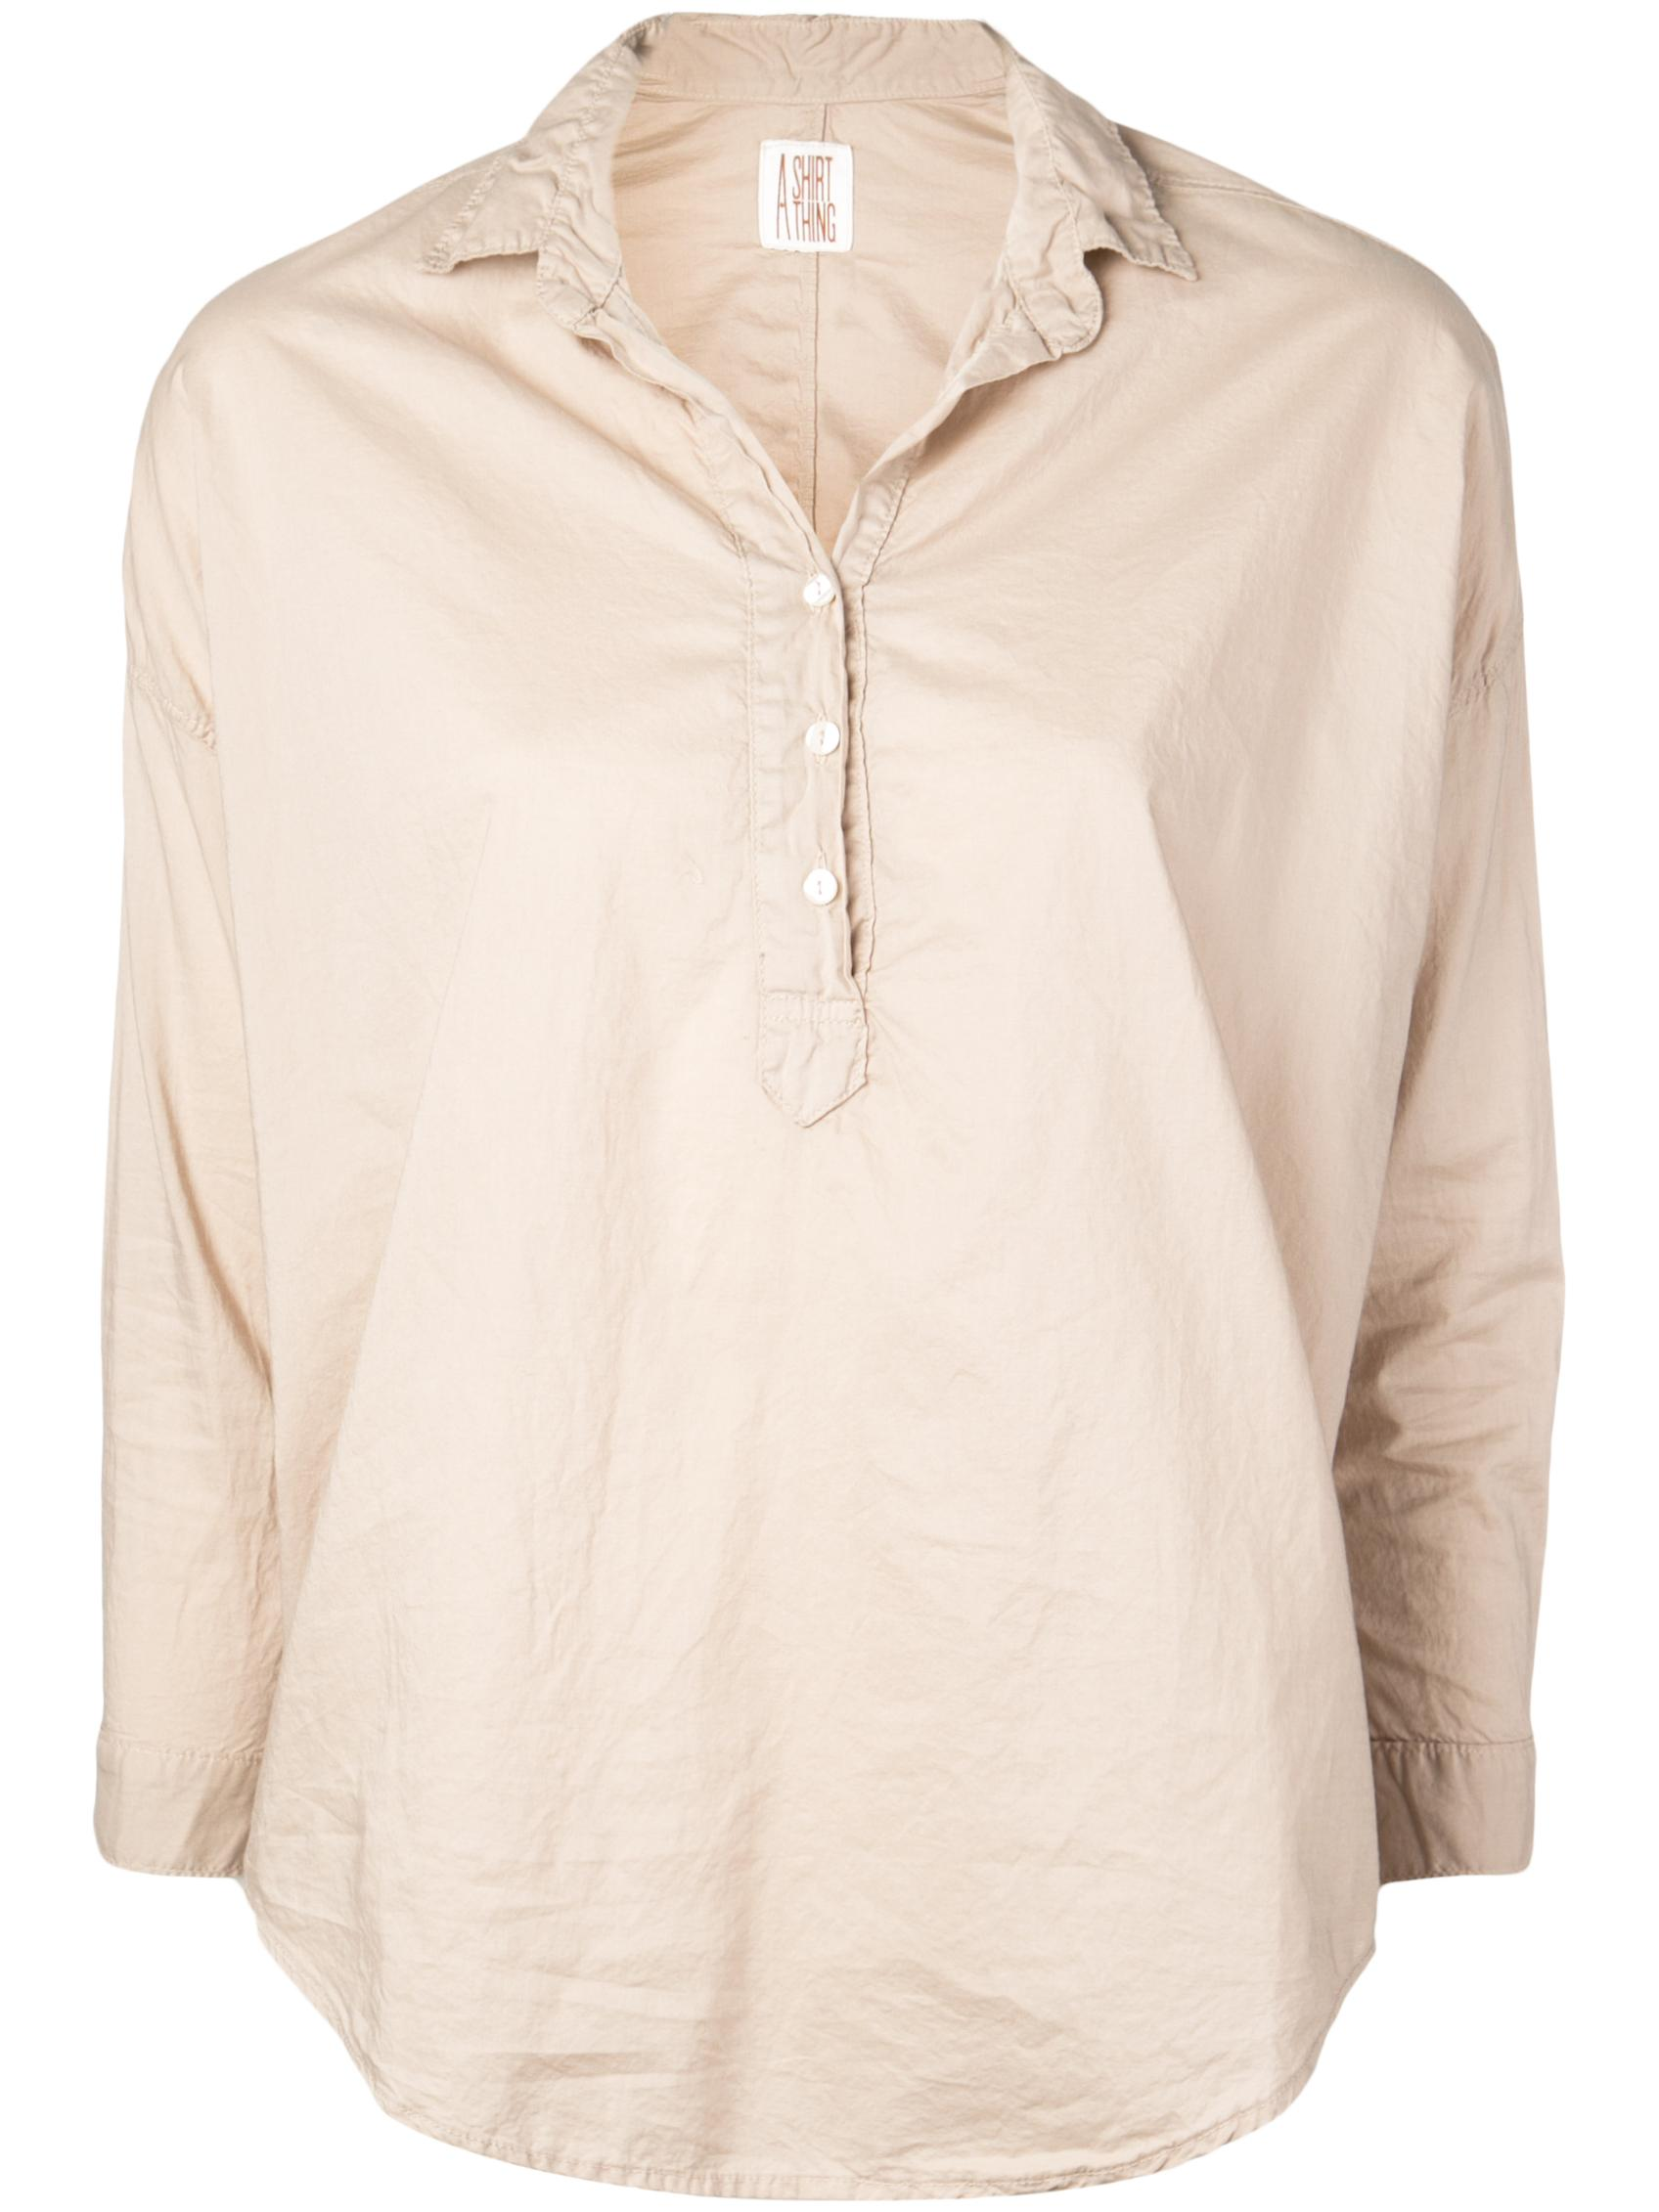 Diego Cabo Button- Up Poplin Shirt Item # TP10188-701